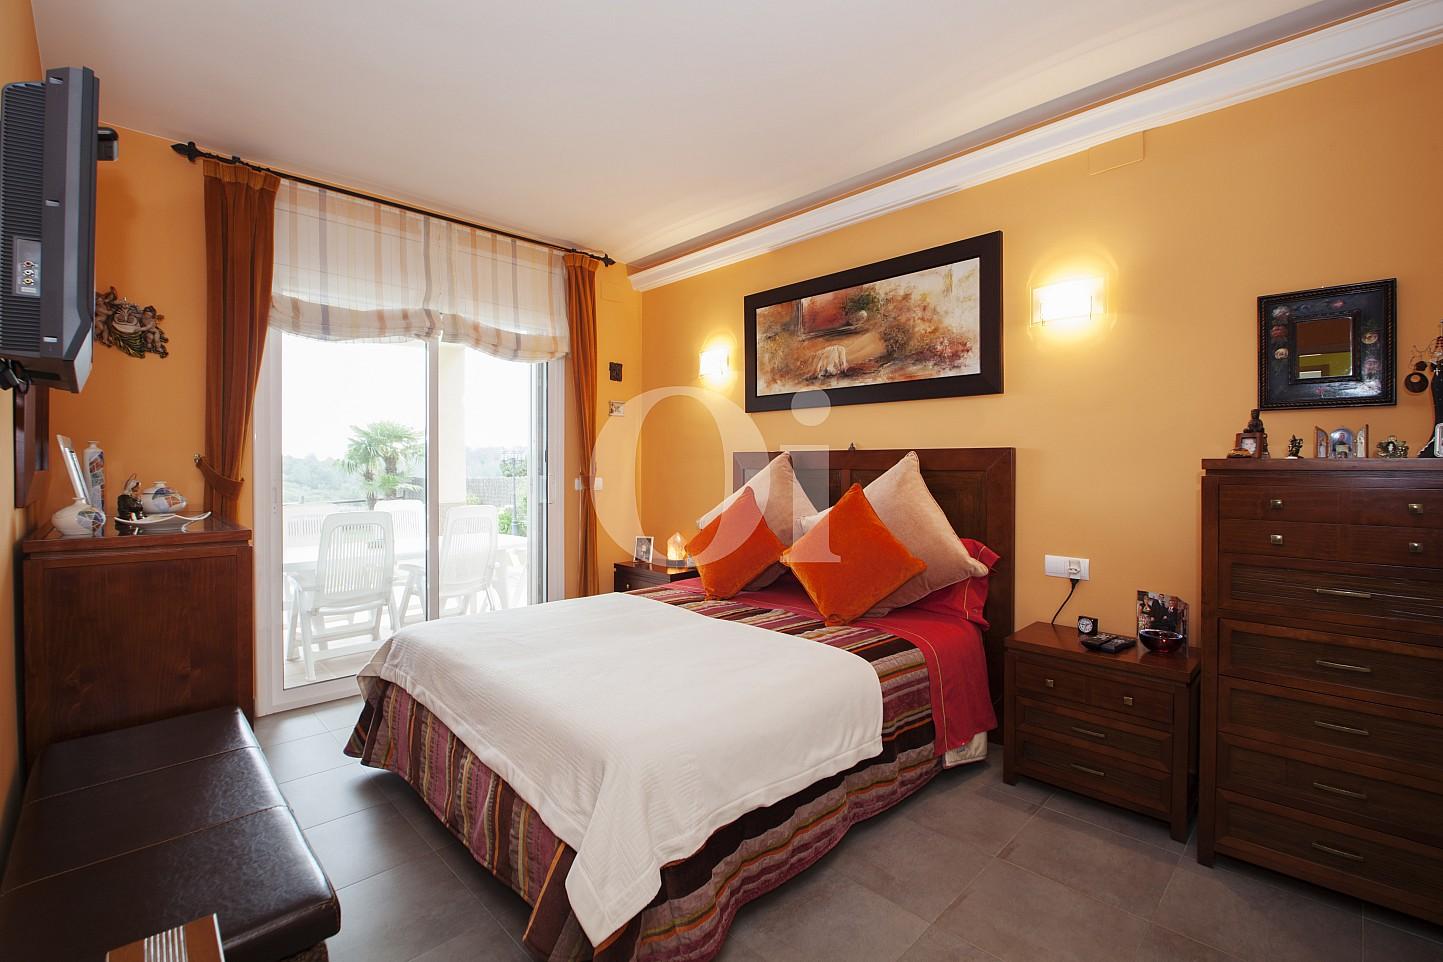 Dormitorio de casa en venta en Segur de Calafell, Baix Penedès, Tarragona